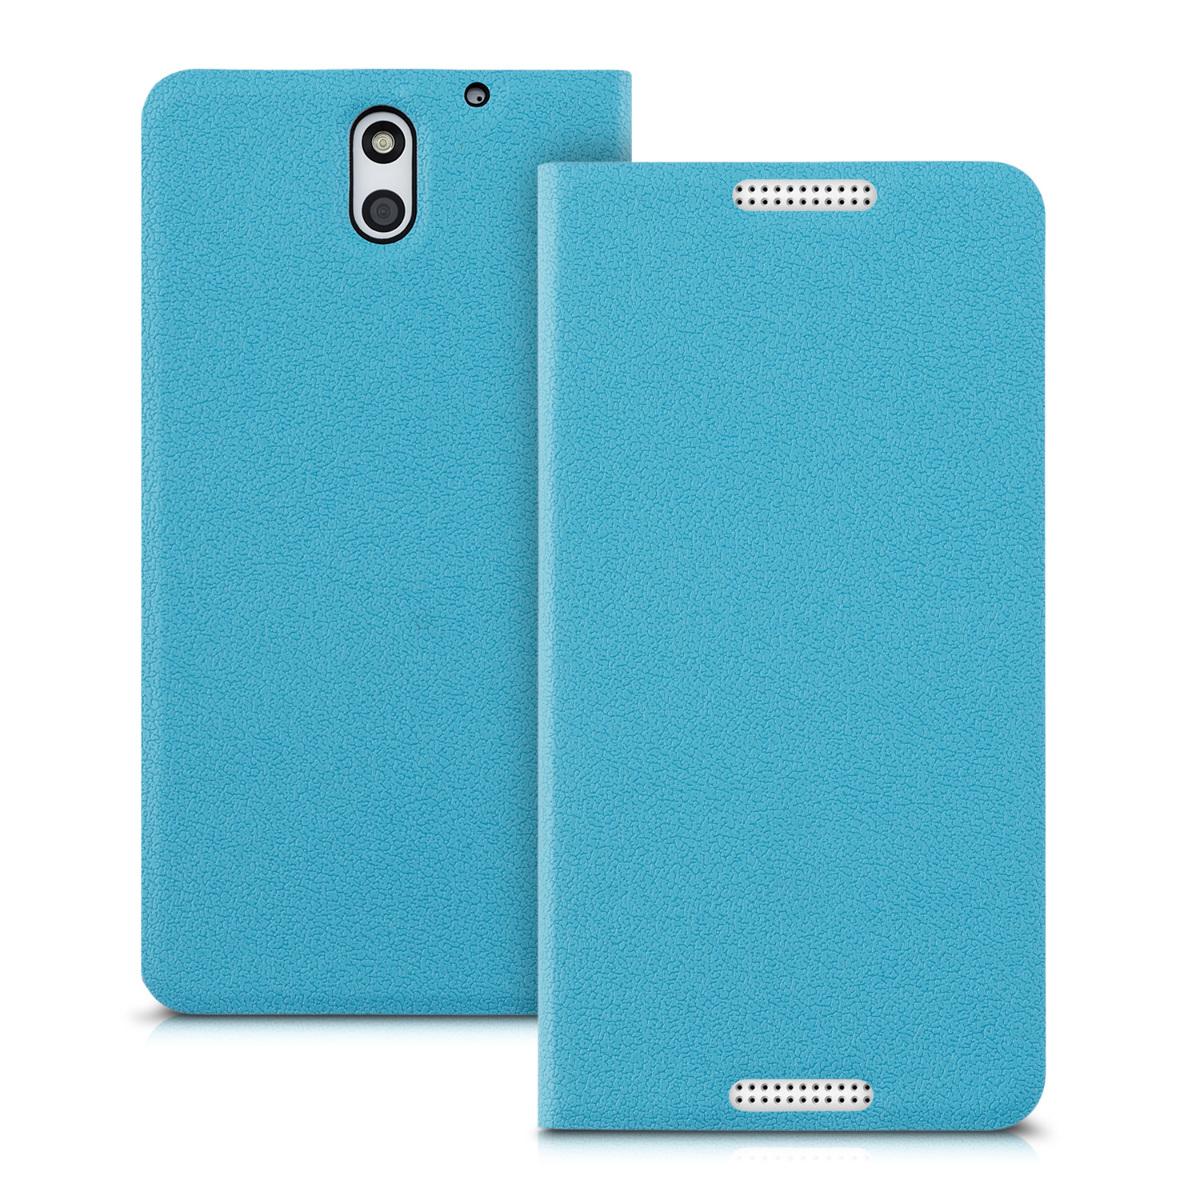 kwmobile FLIP COVER FOR HTC DESIRE 610 CASE SLIM BACK SHELL HARD MOBILE PHONE